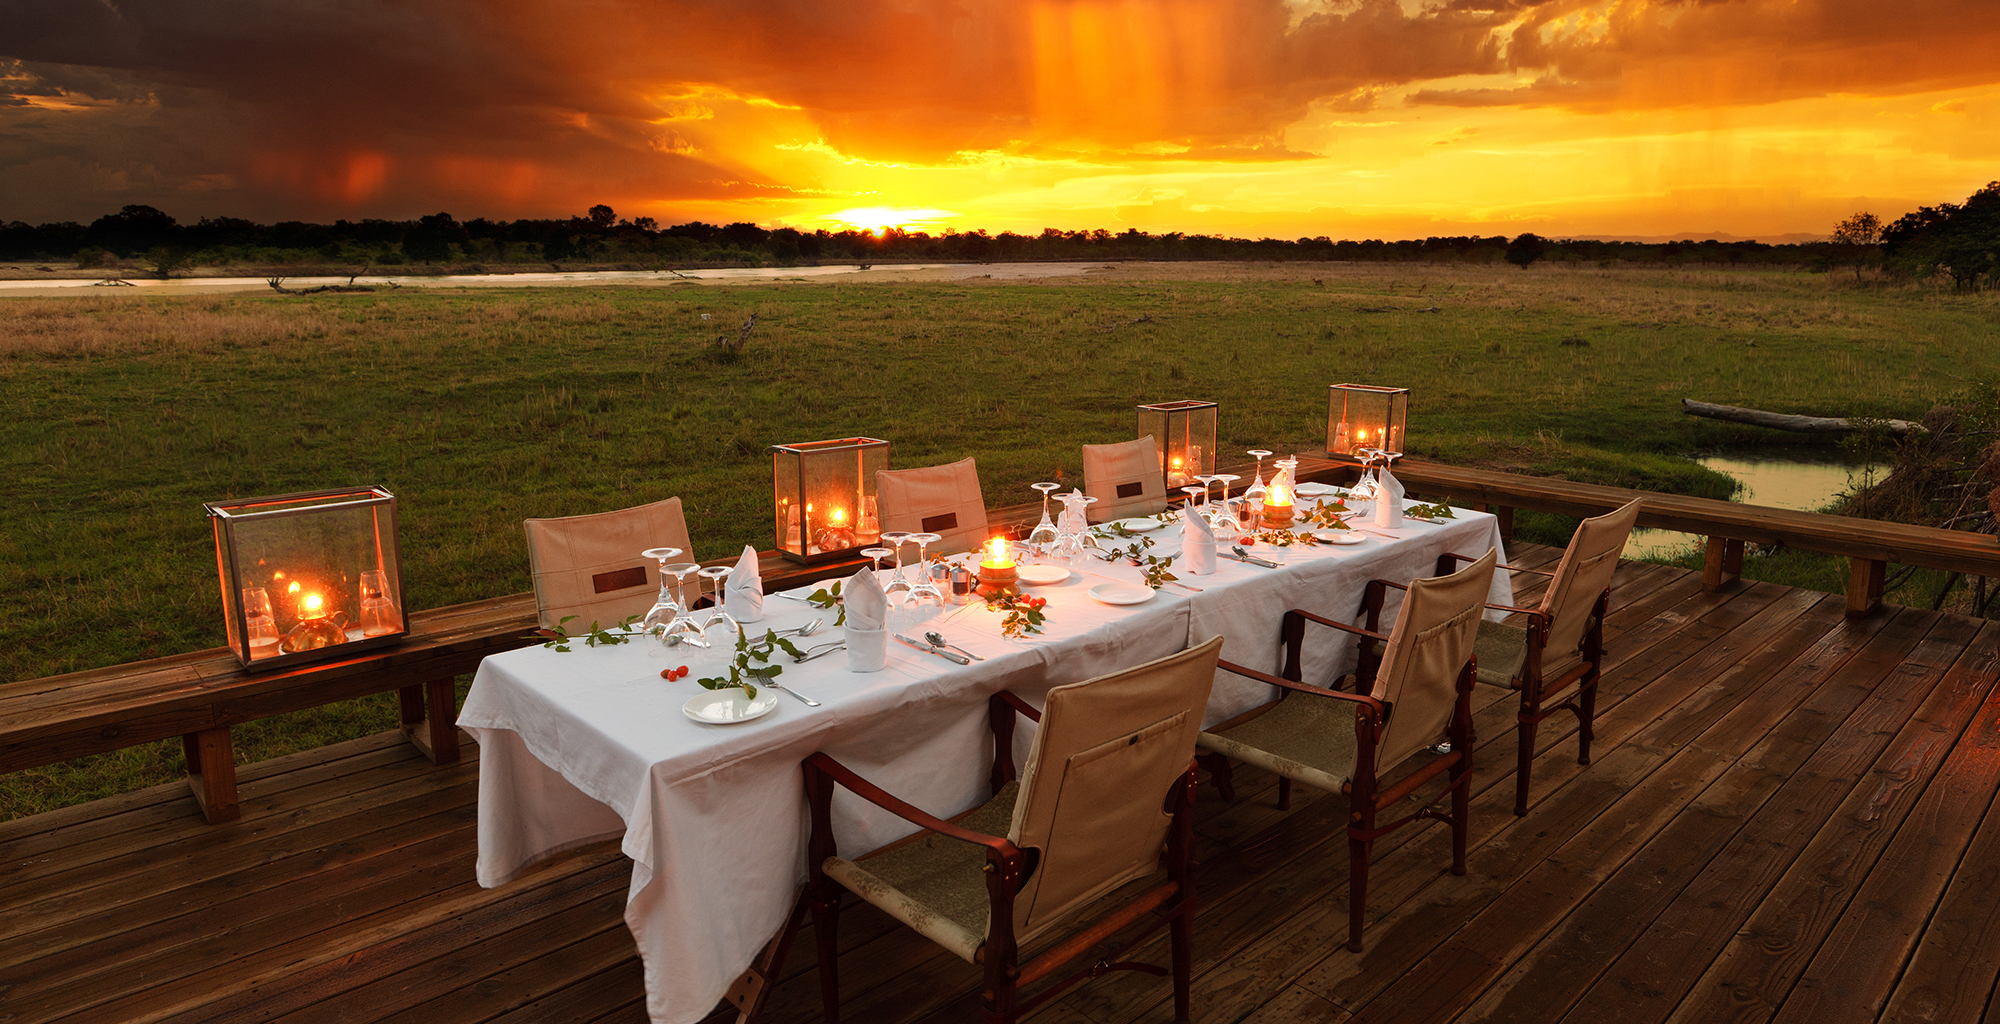 Zambia-Zungulila-Outdoor-Dining